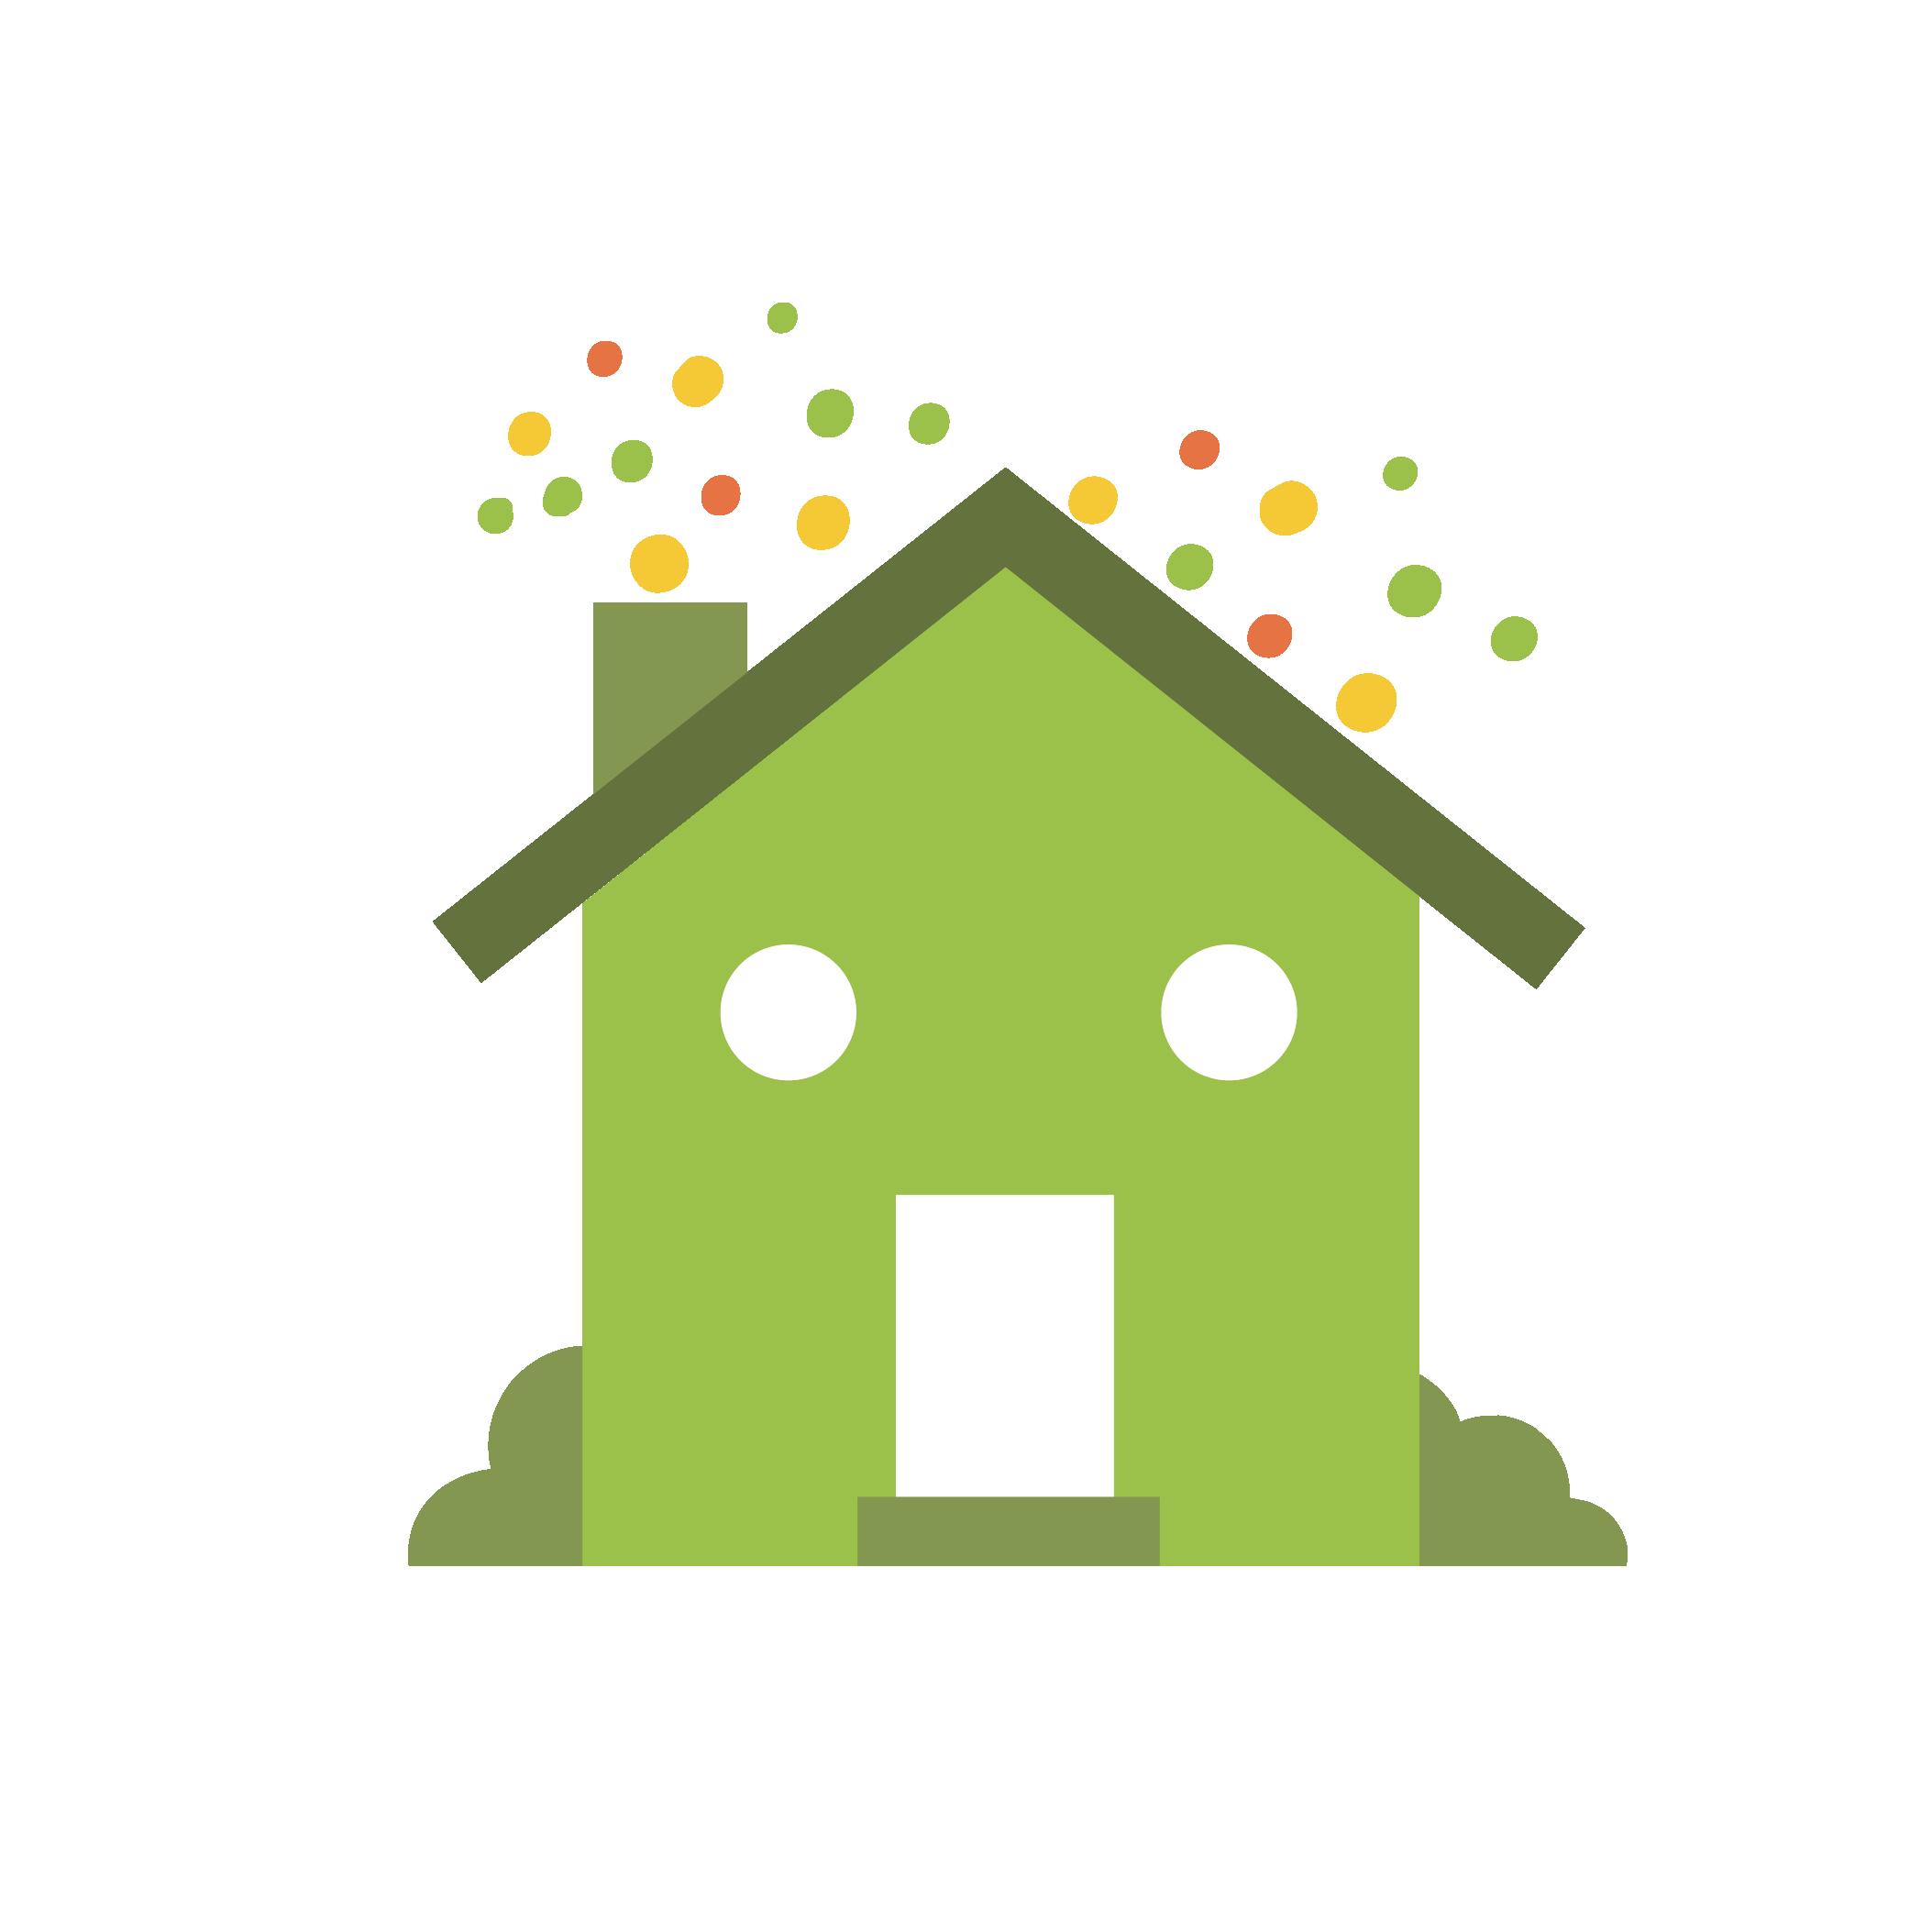 House with solar panels clipart stock Renewable energy Energy conservation Energy management Solar energy ... stock